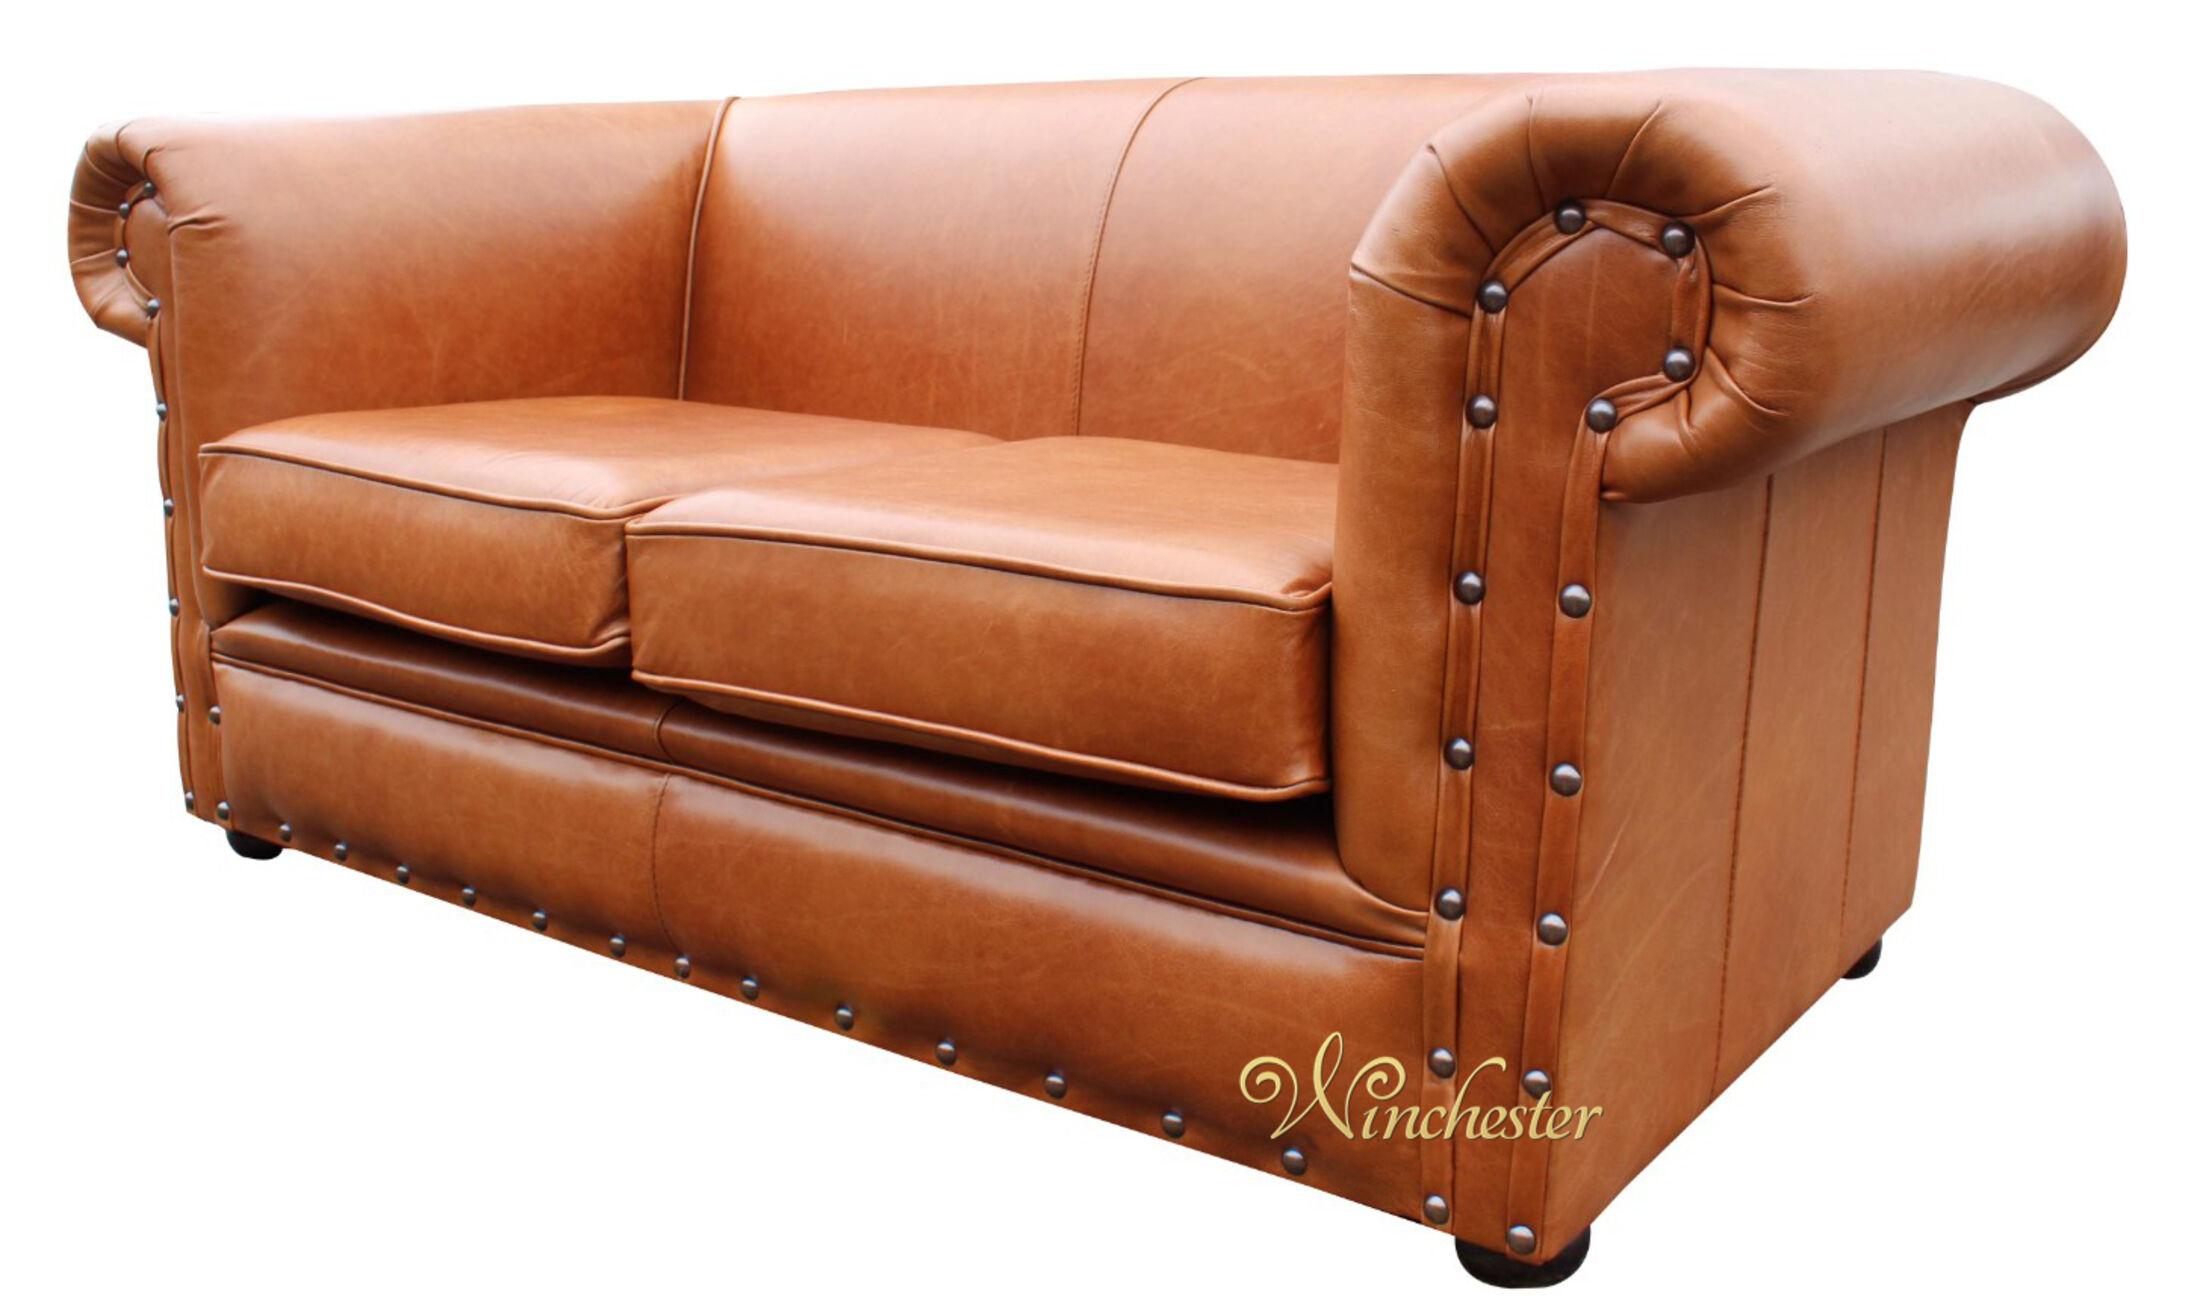 ... Chesterfield Decor Anile Saddle Leather Sofa Wc